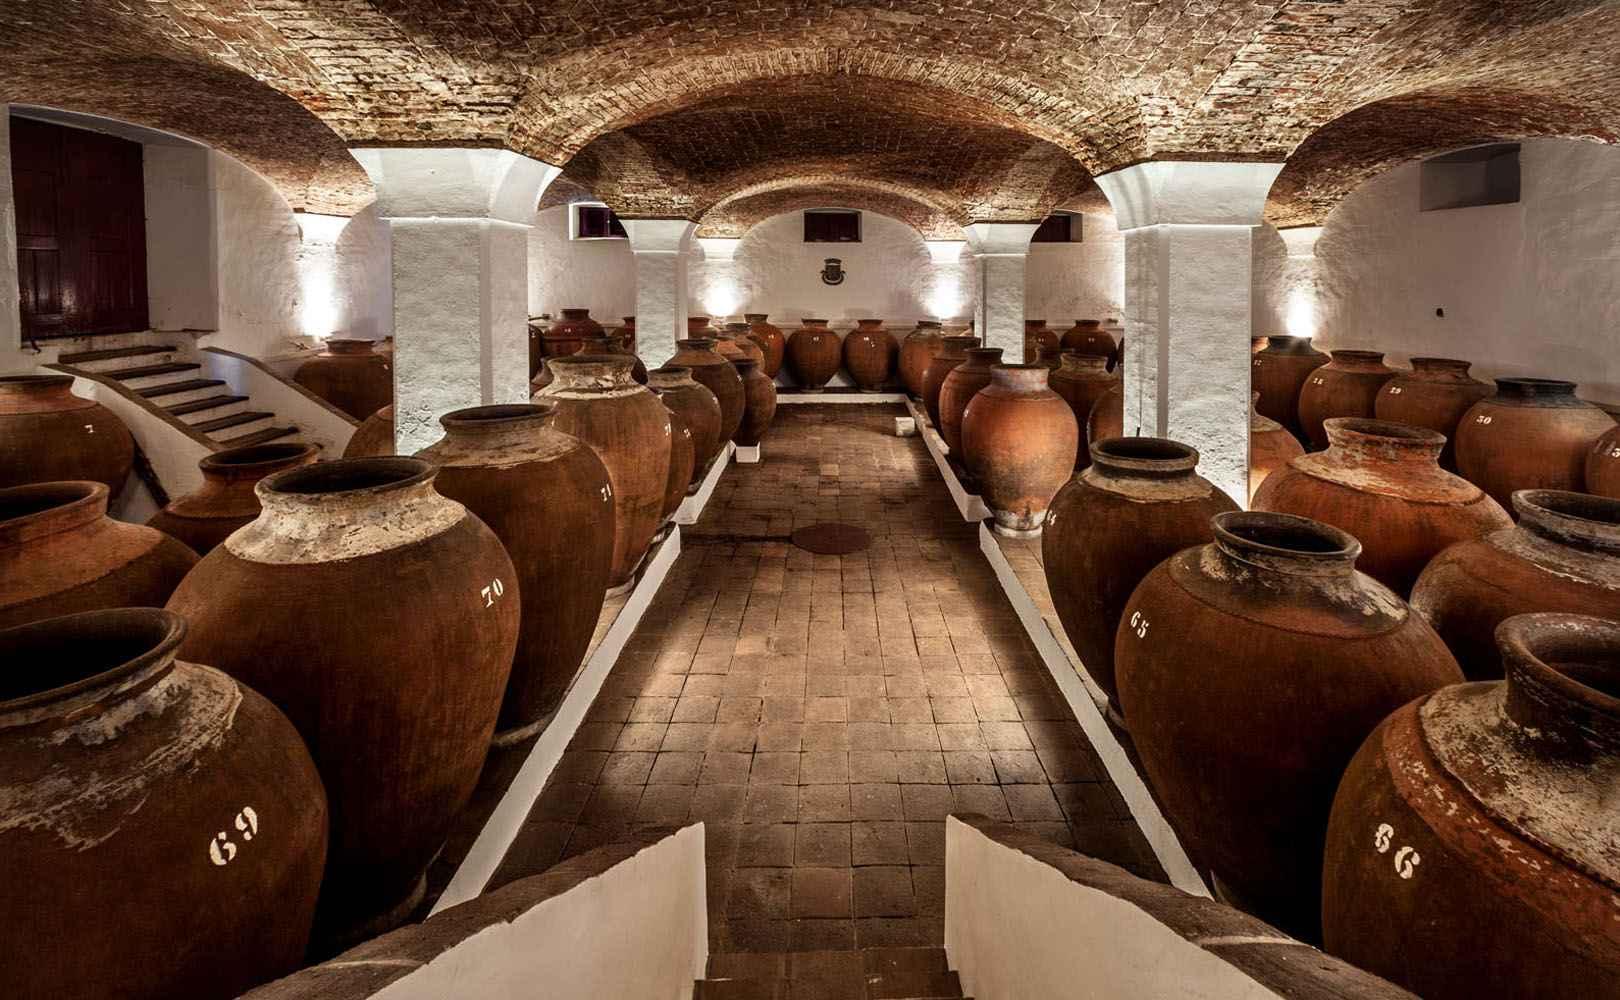 Weinkritik: José Maria da Fonseca, José de Sousa Mayor 2012, Alentejo, Portugal